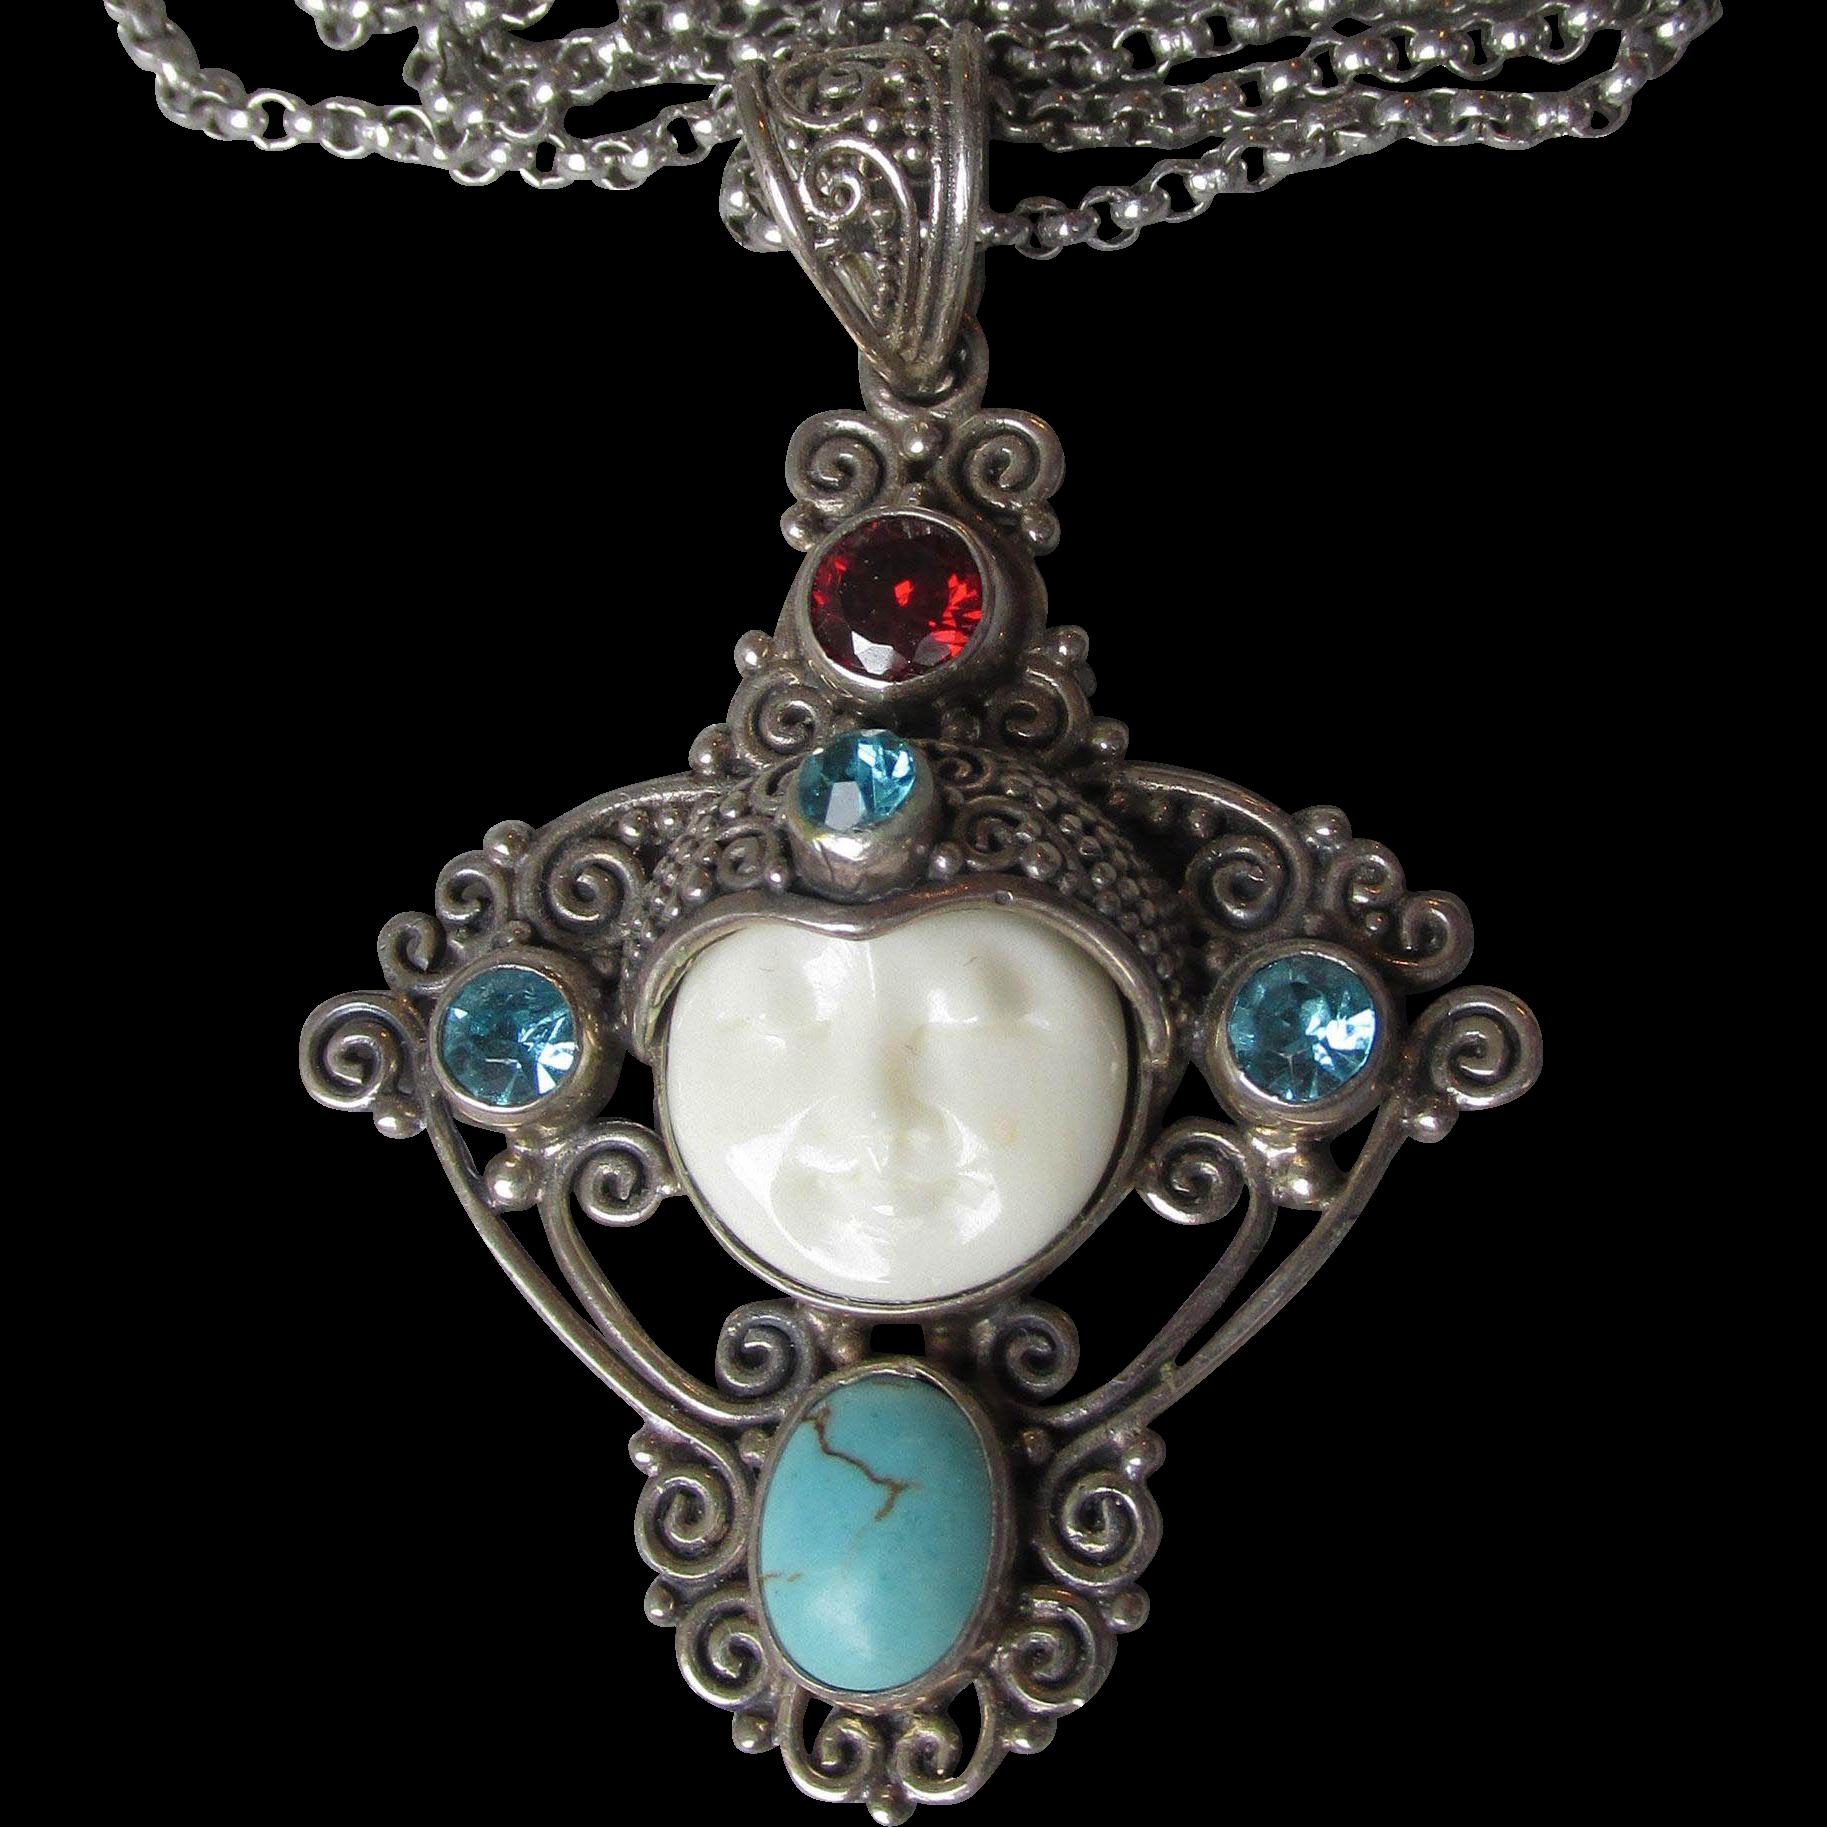 Magnificent Vintage Sterling Silver & Gemstone Carved Bone Moon Goddess Face Necklace with Garnet, Blue Topaz, & Howlite